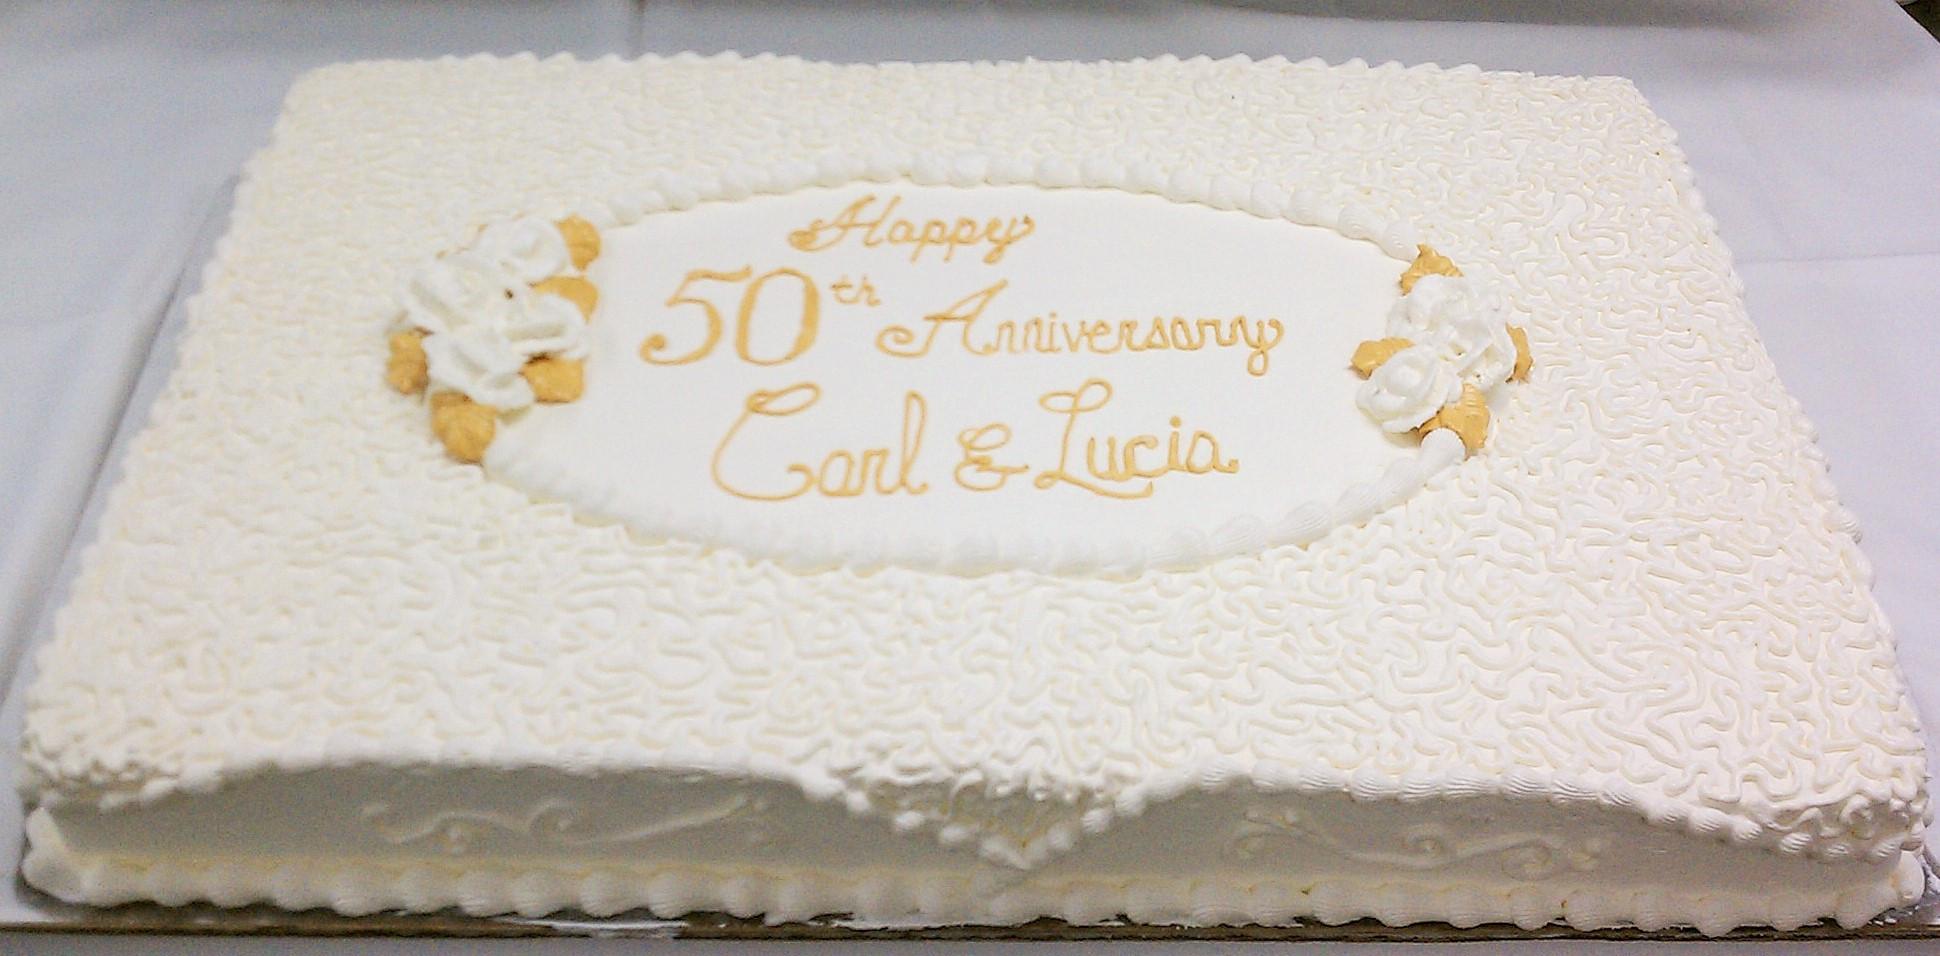 50Th Wedding Anniversary Sheet Cakes  50th Wedding Anniversary Sheet Cakes Wedding Cake Flavors